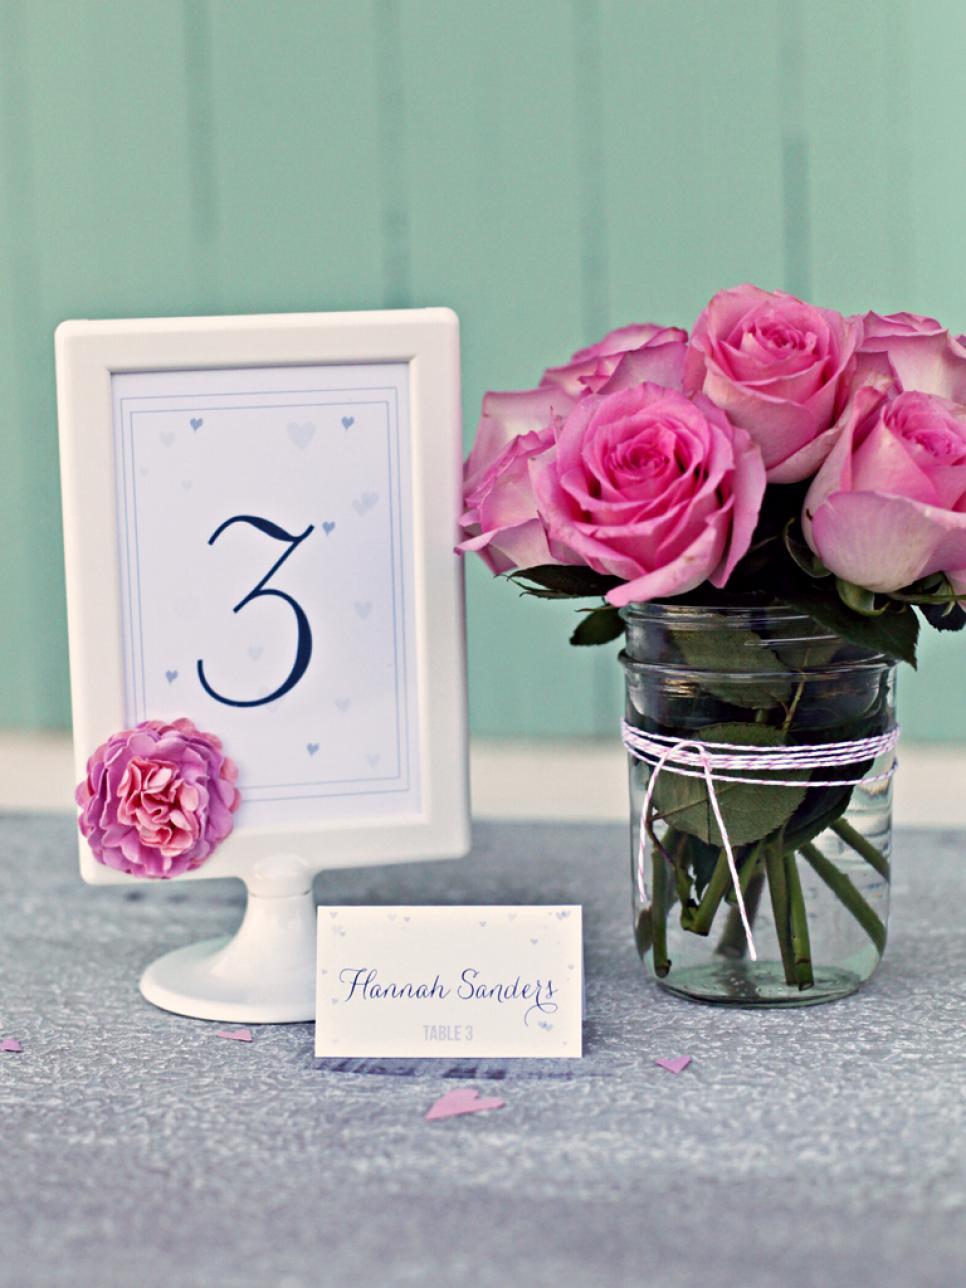 21 DIY Wedding Table Number Ideas